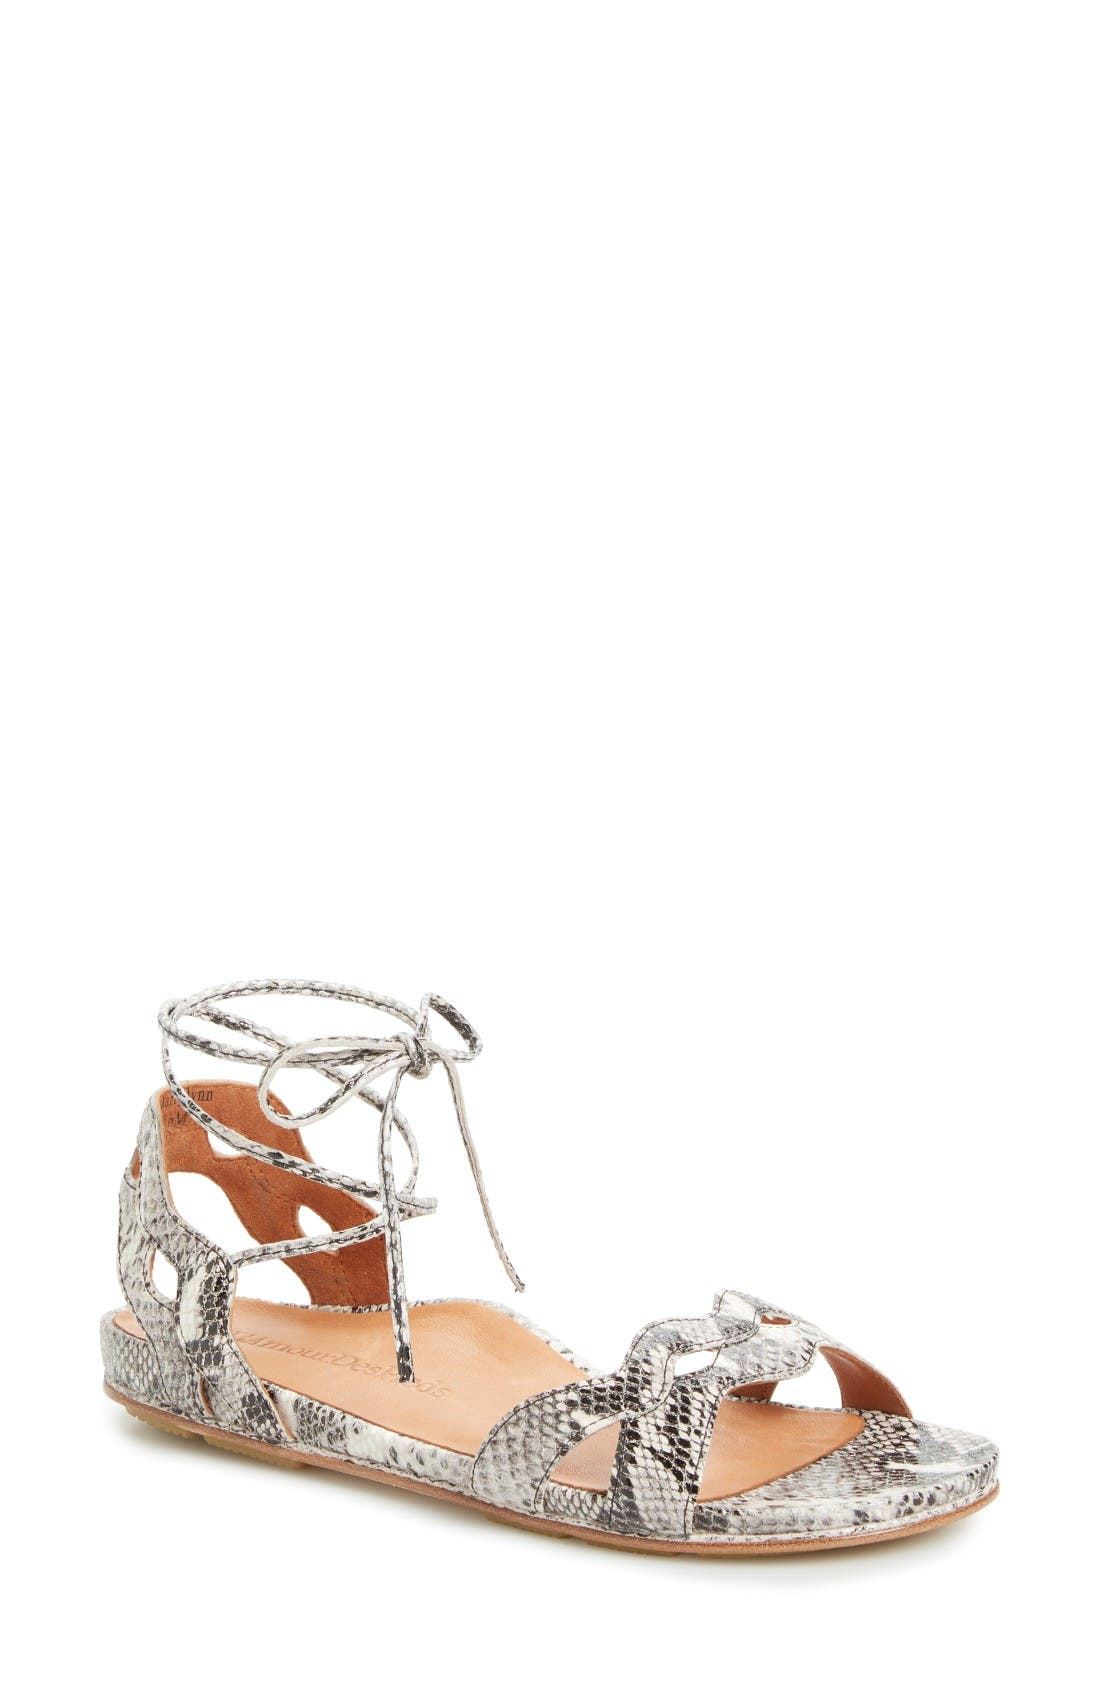 Alternate Image 1 Selected - L'Amour des Pieds Darrylynn Wraparound Lace-Up Sandal (Women)